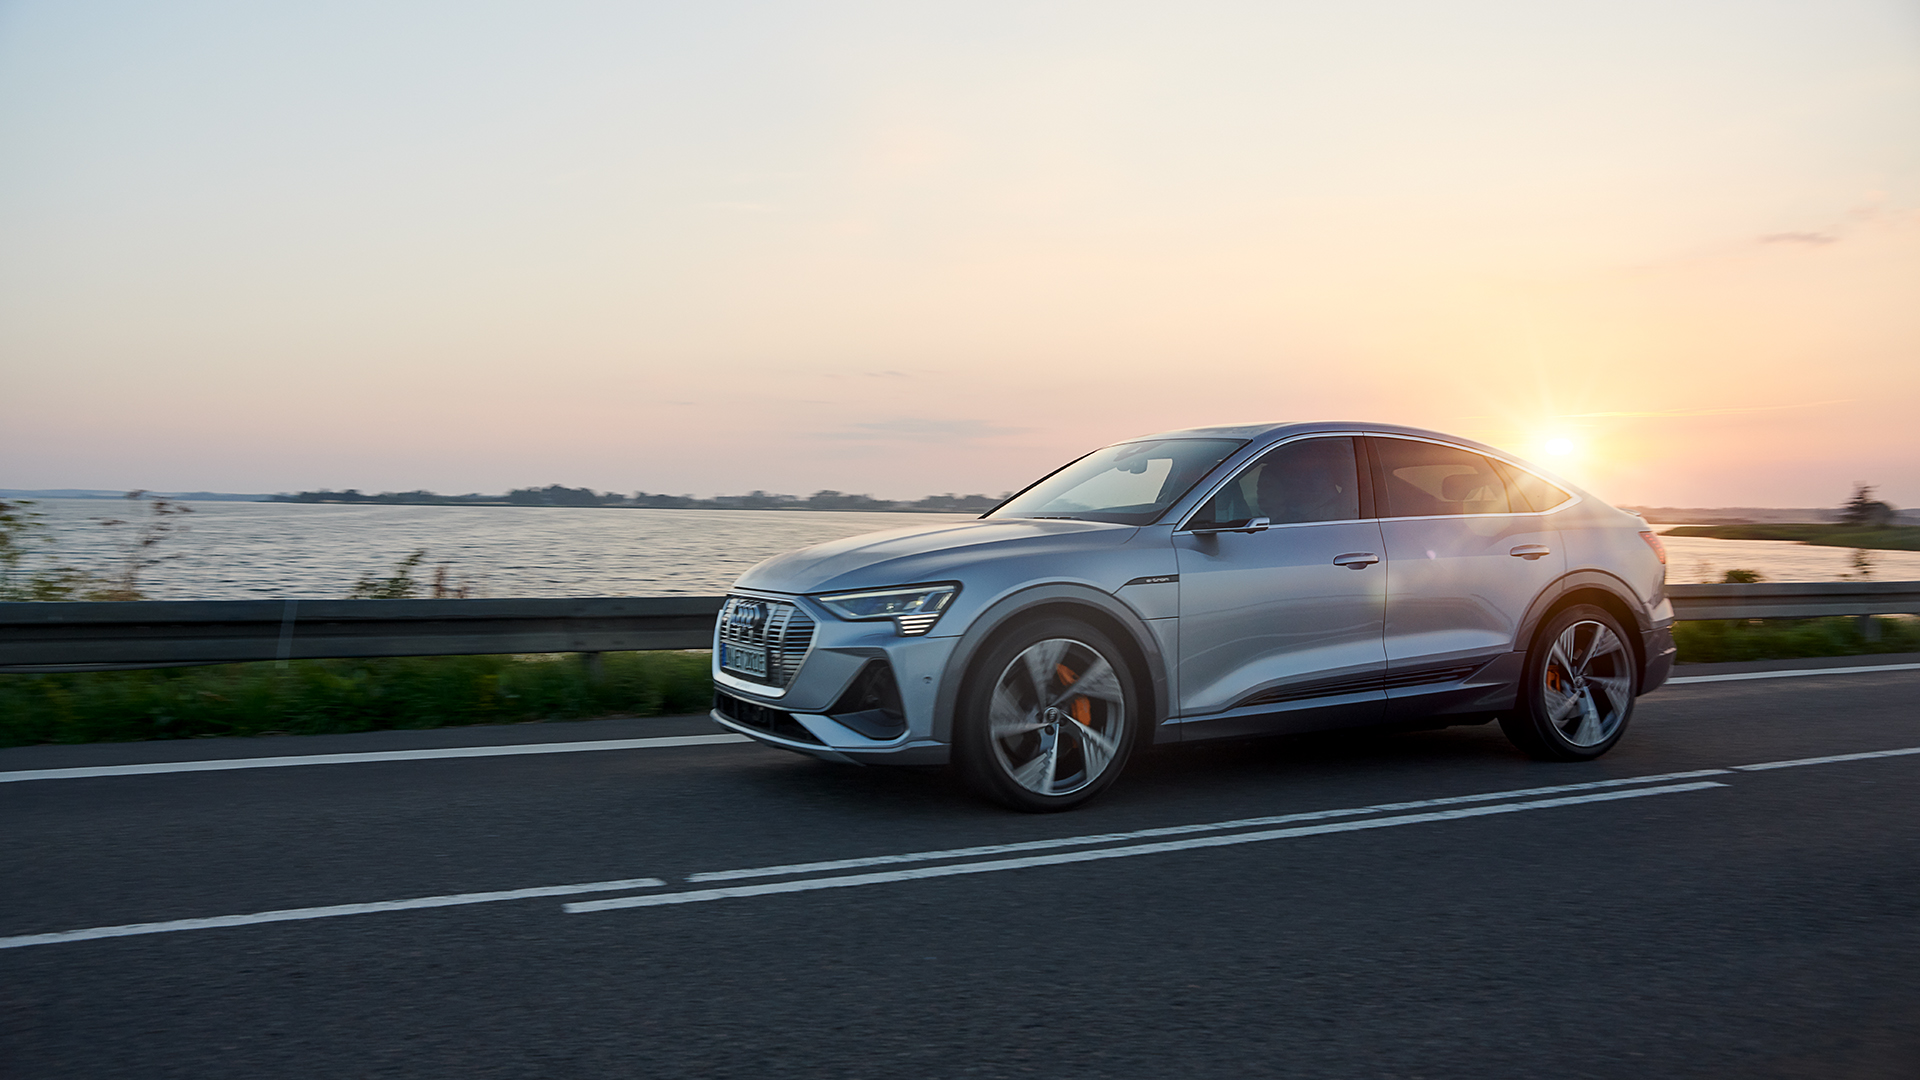 Florett srebrn Audi e-tron Sportback SUV coupé na avtocesti v jutranji zori.